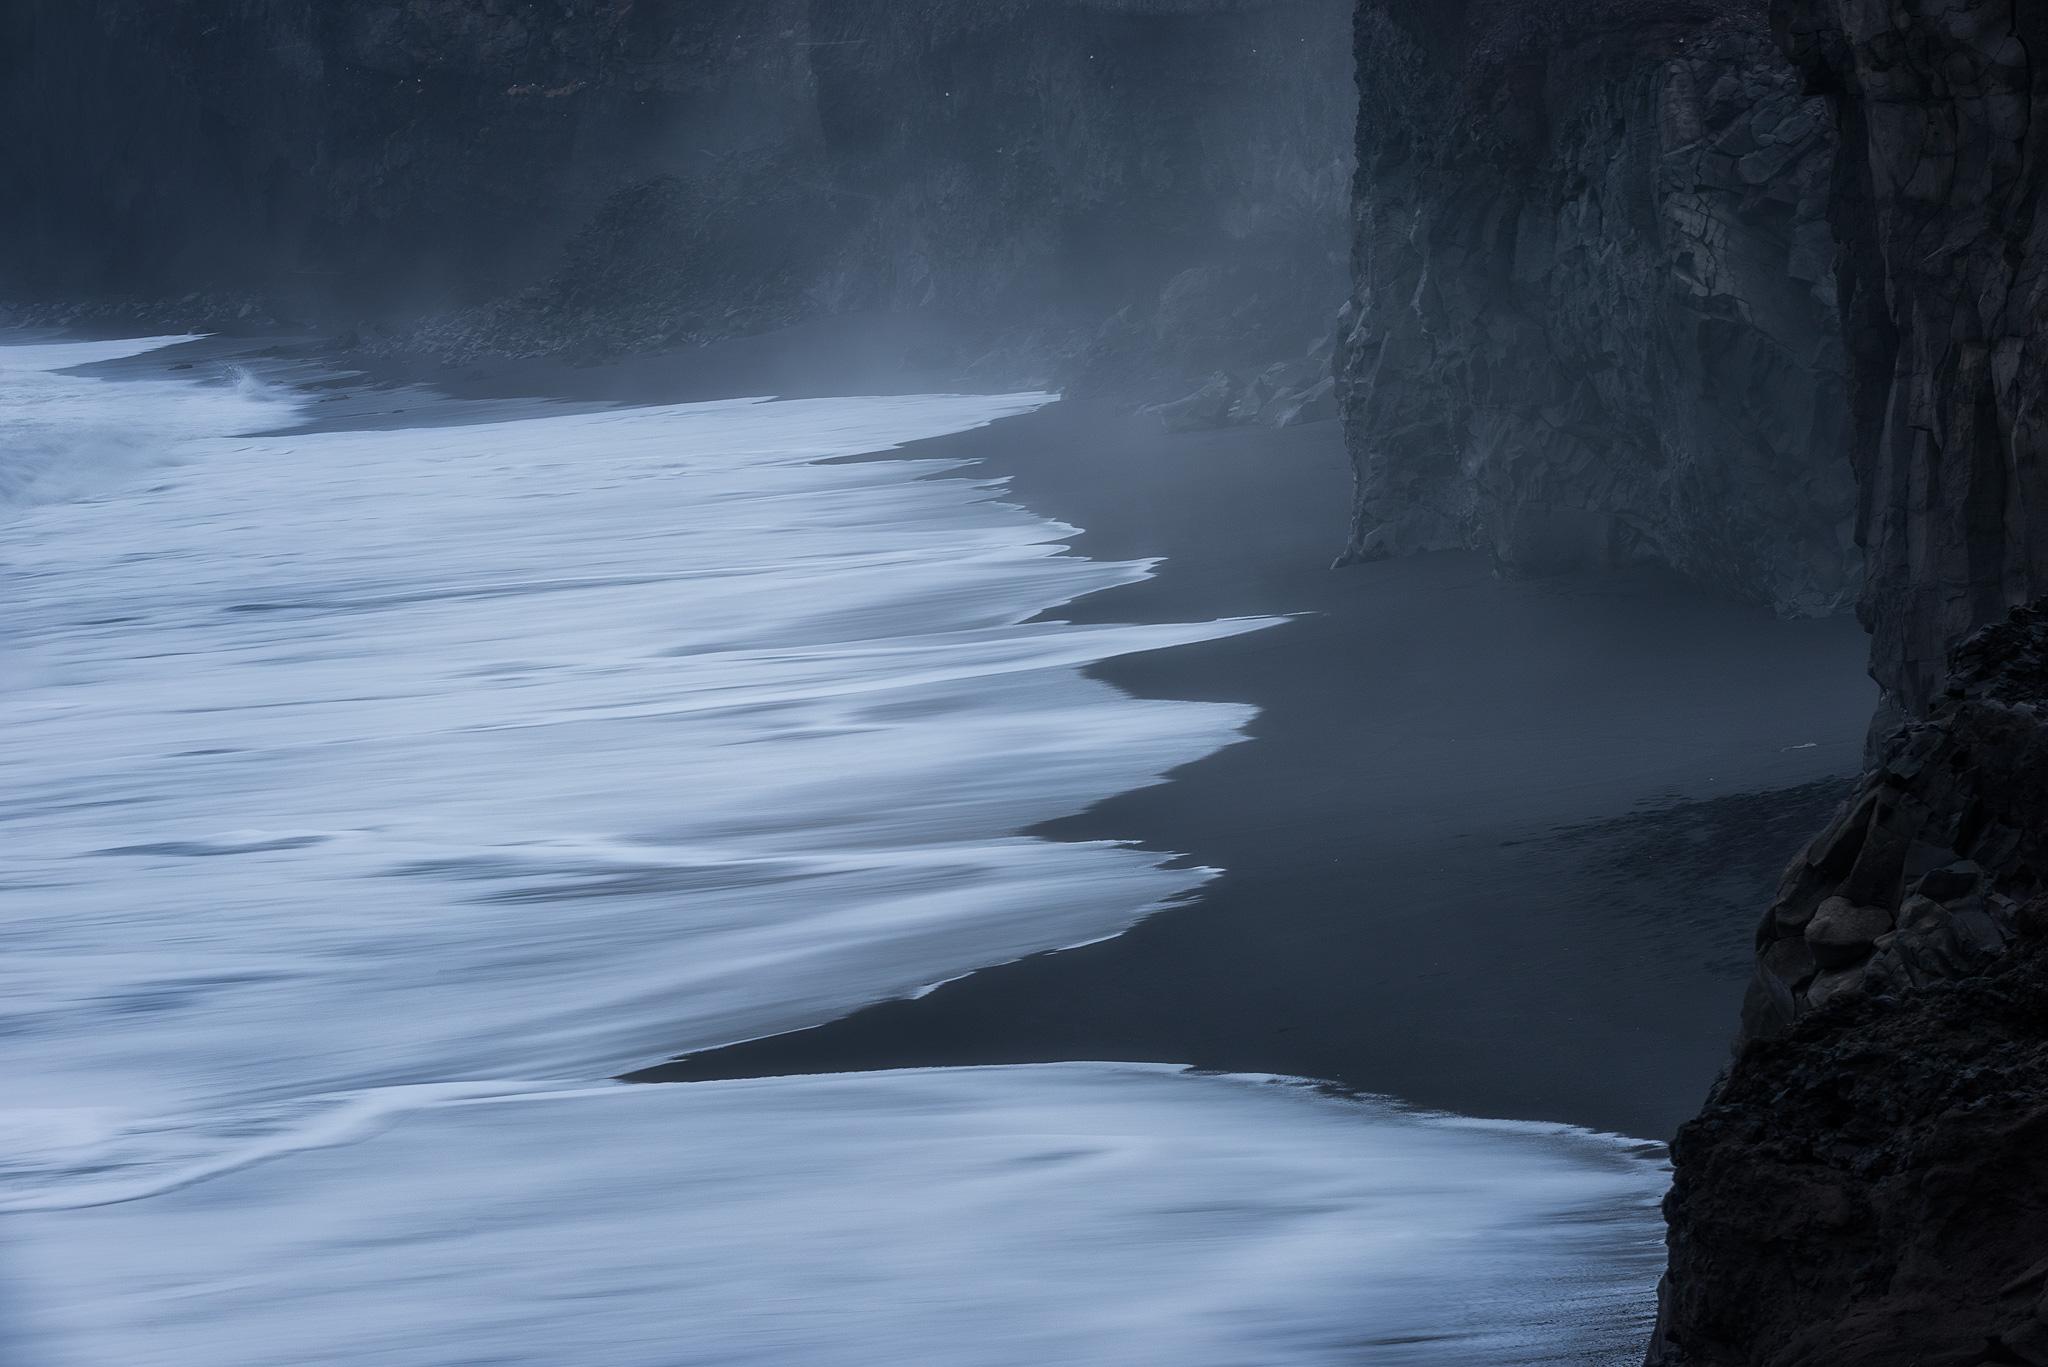 Christian Hoiberg - Landscape Photography